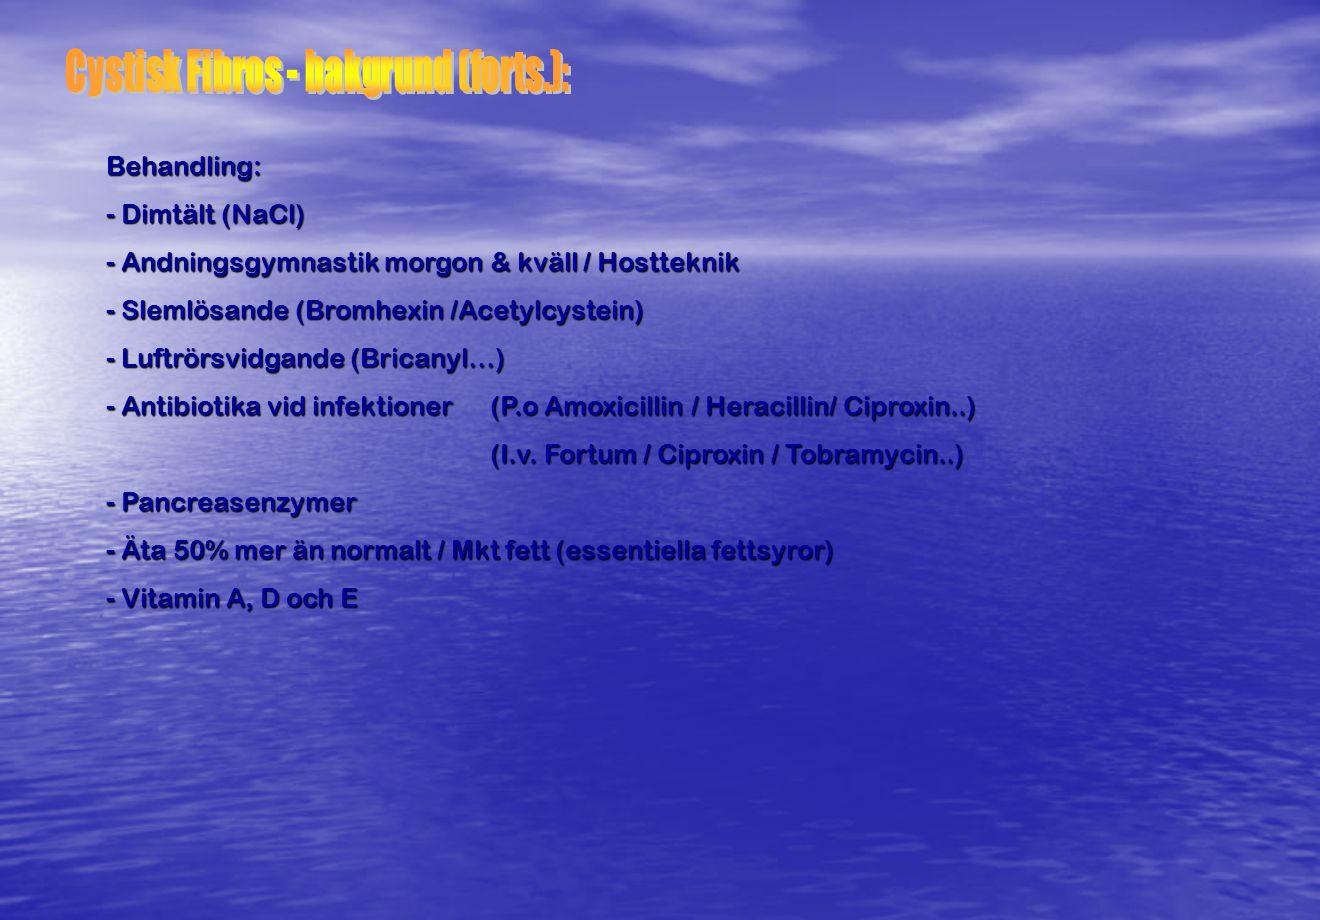 Cystisk Fibros - bakgrund (forts.):